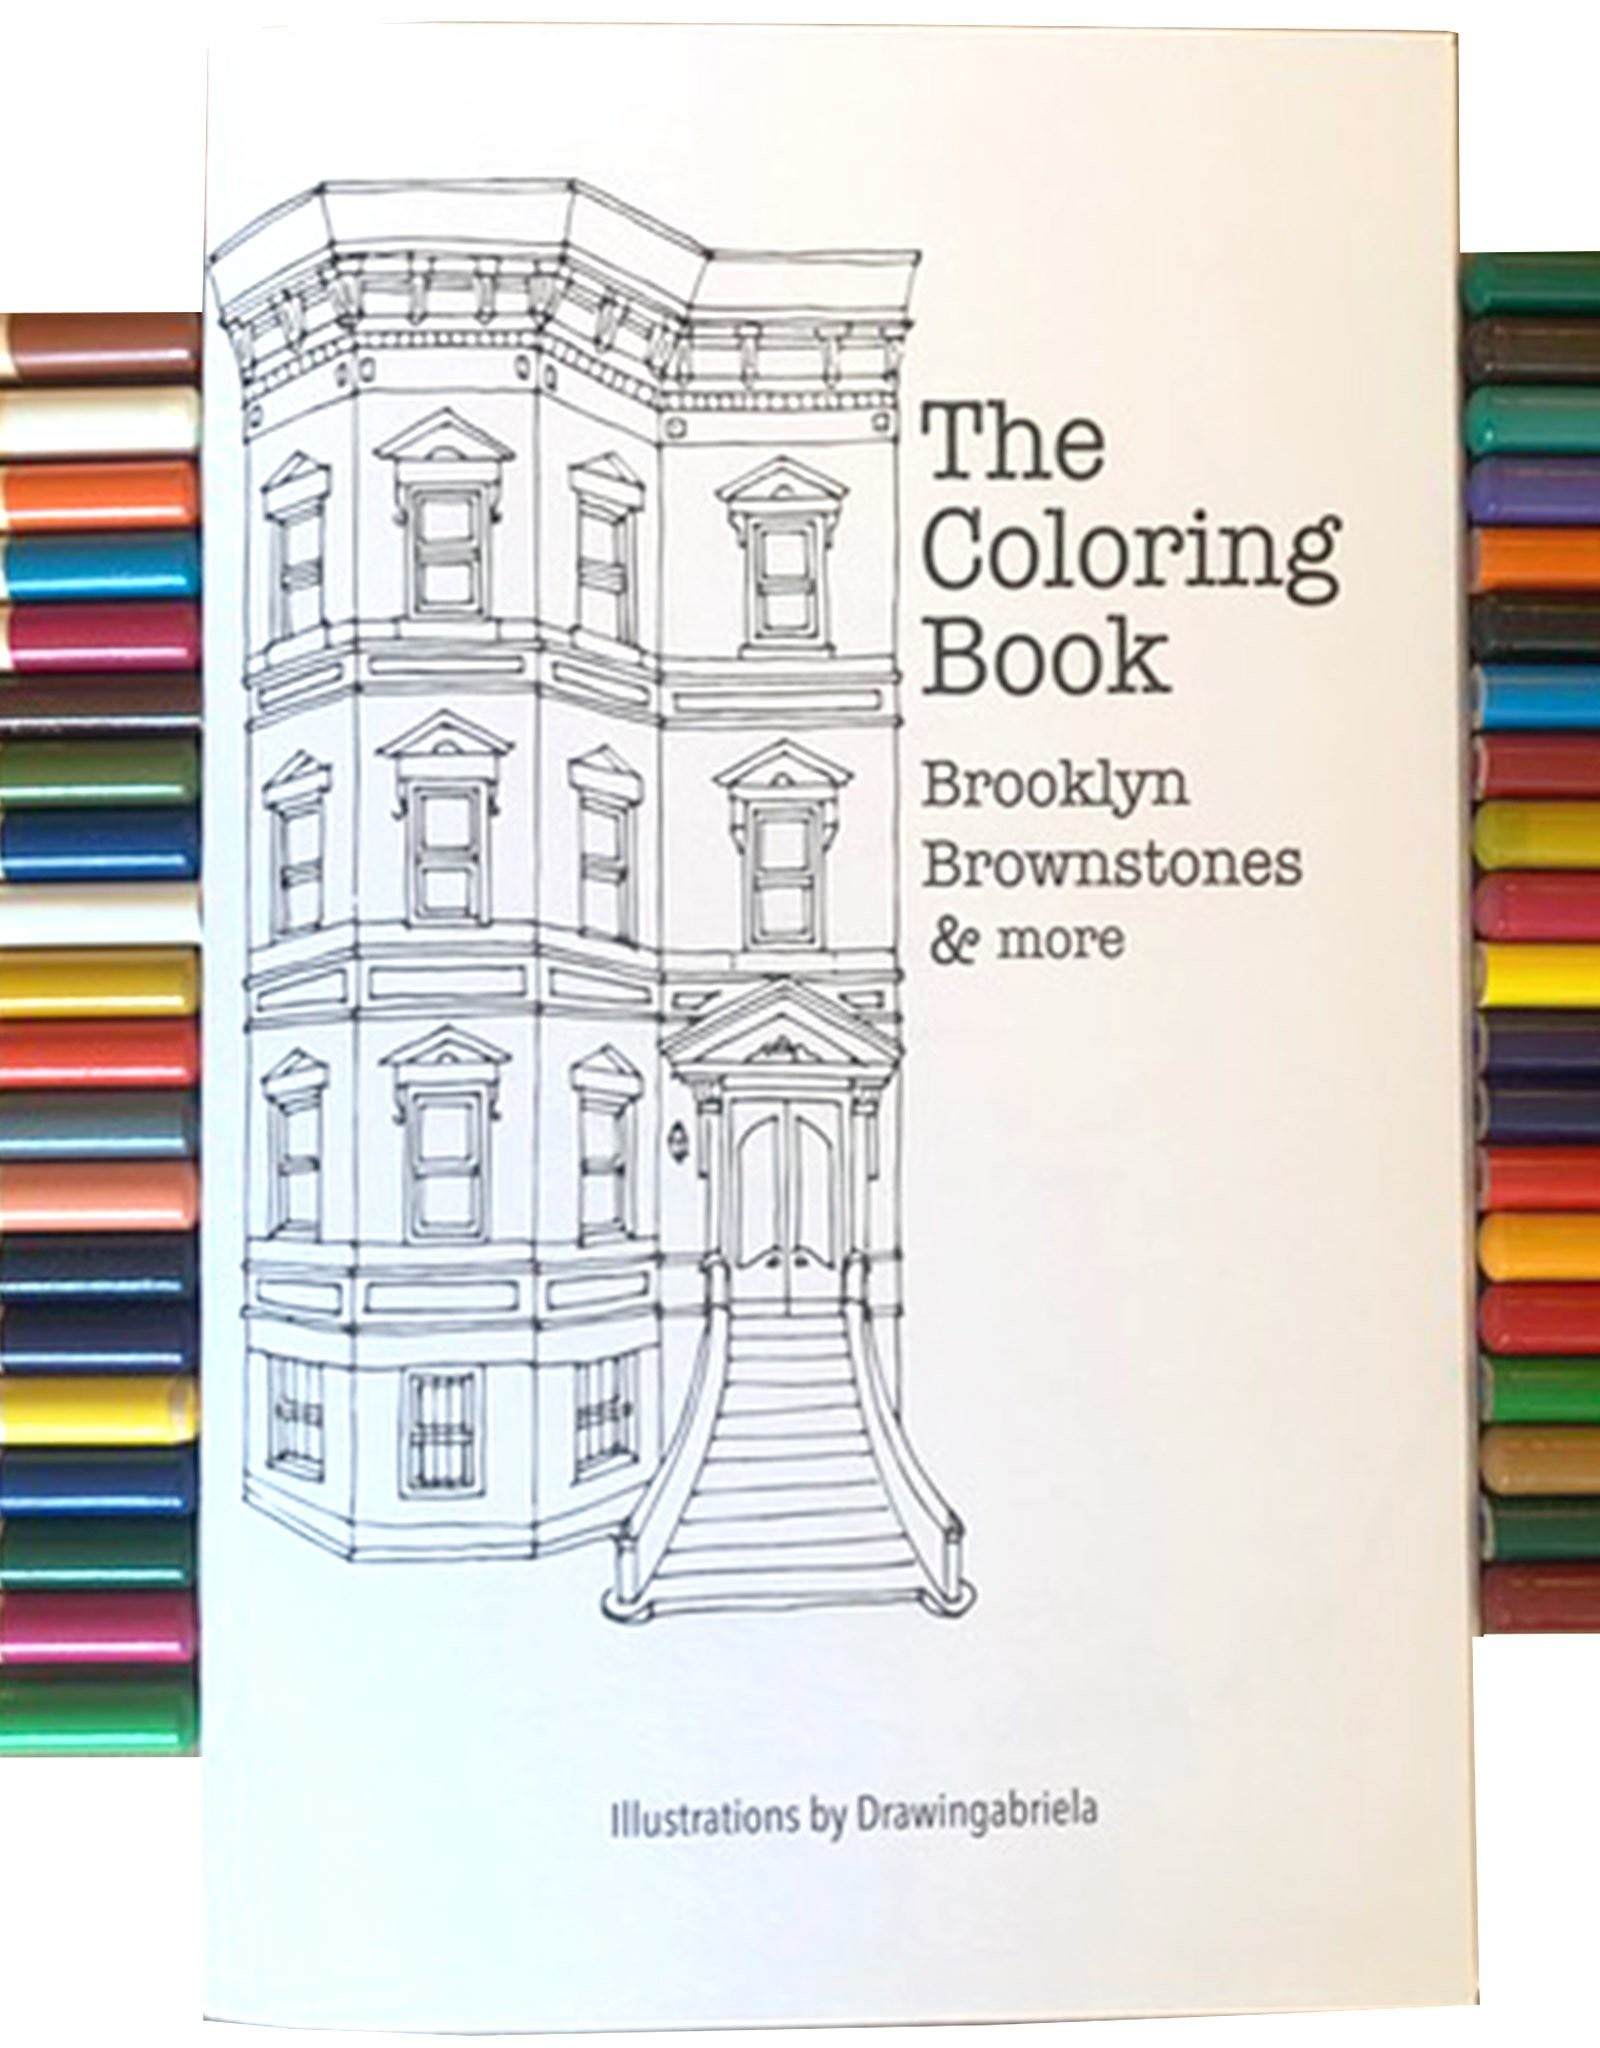 Brooklyn Brownstone Coloring Book